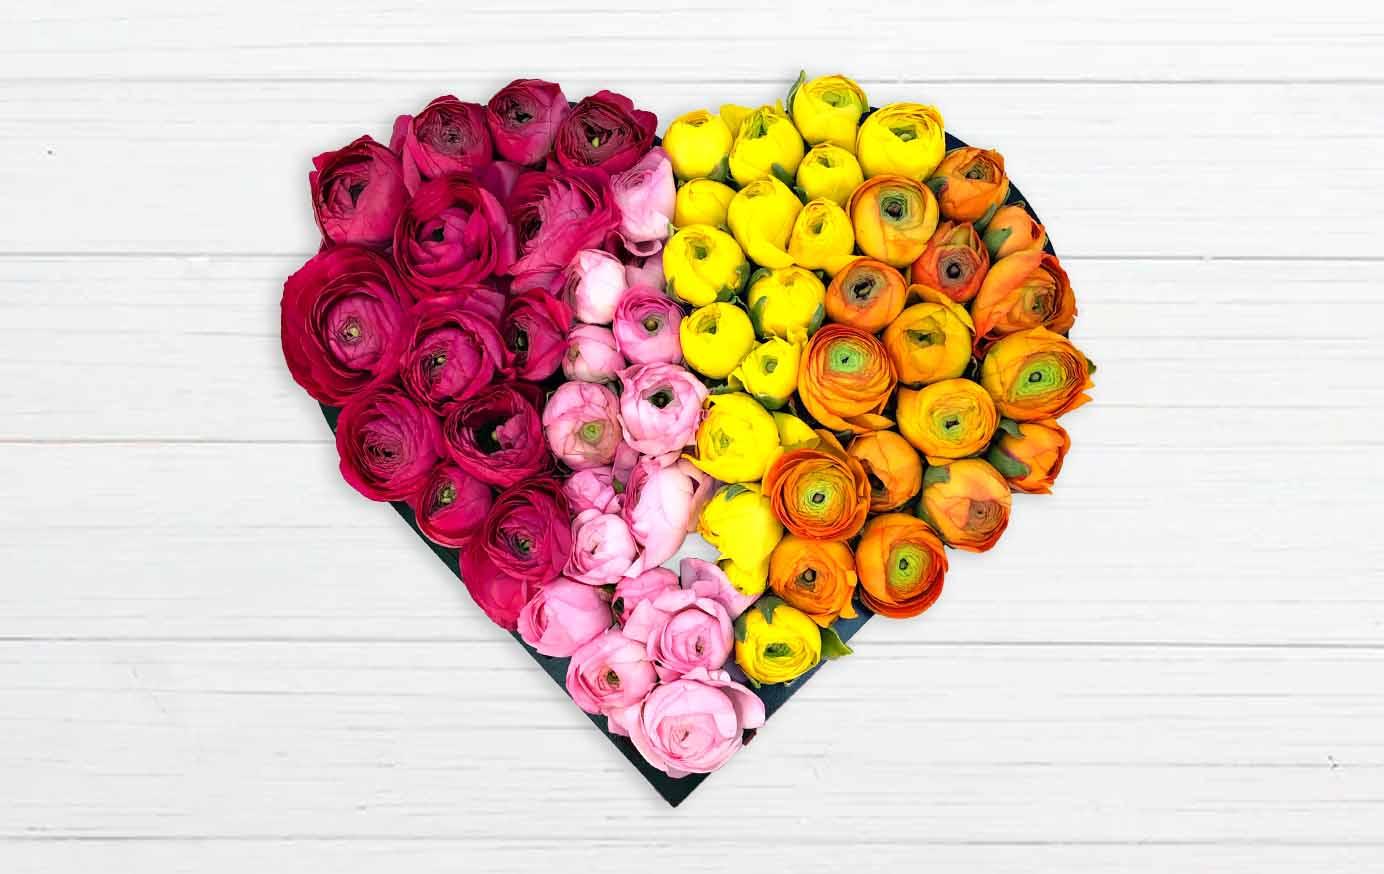 خرید باکس گل قلبی آلاله